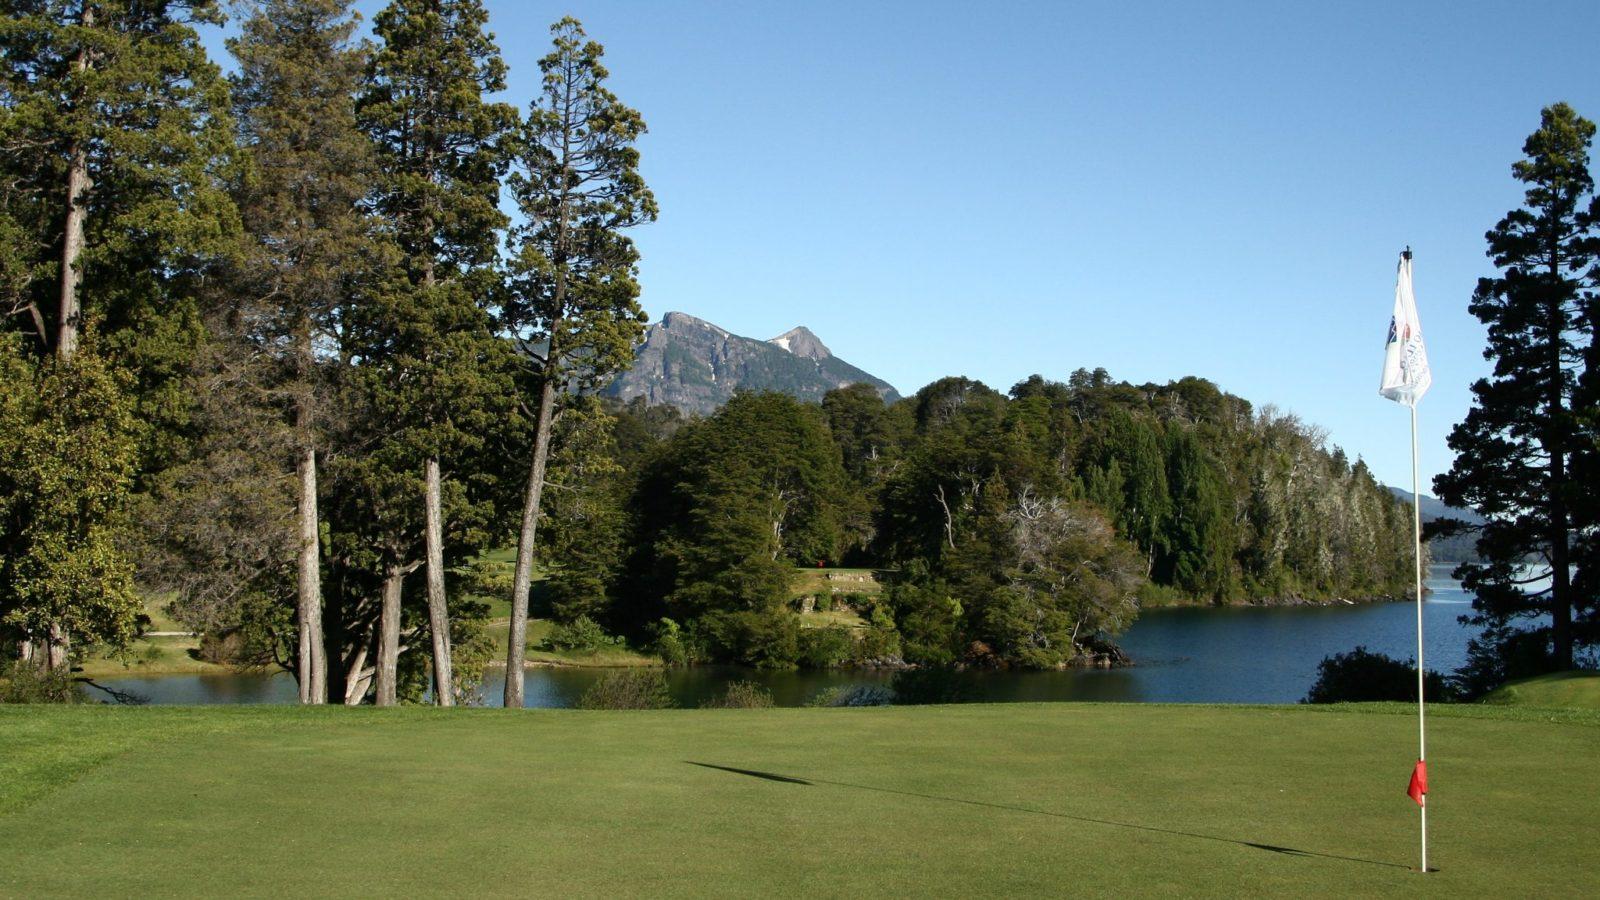 Buenos Aires Patagonia Golf-Argentina golf-Patagonia Llao Llao Golf